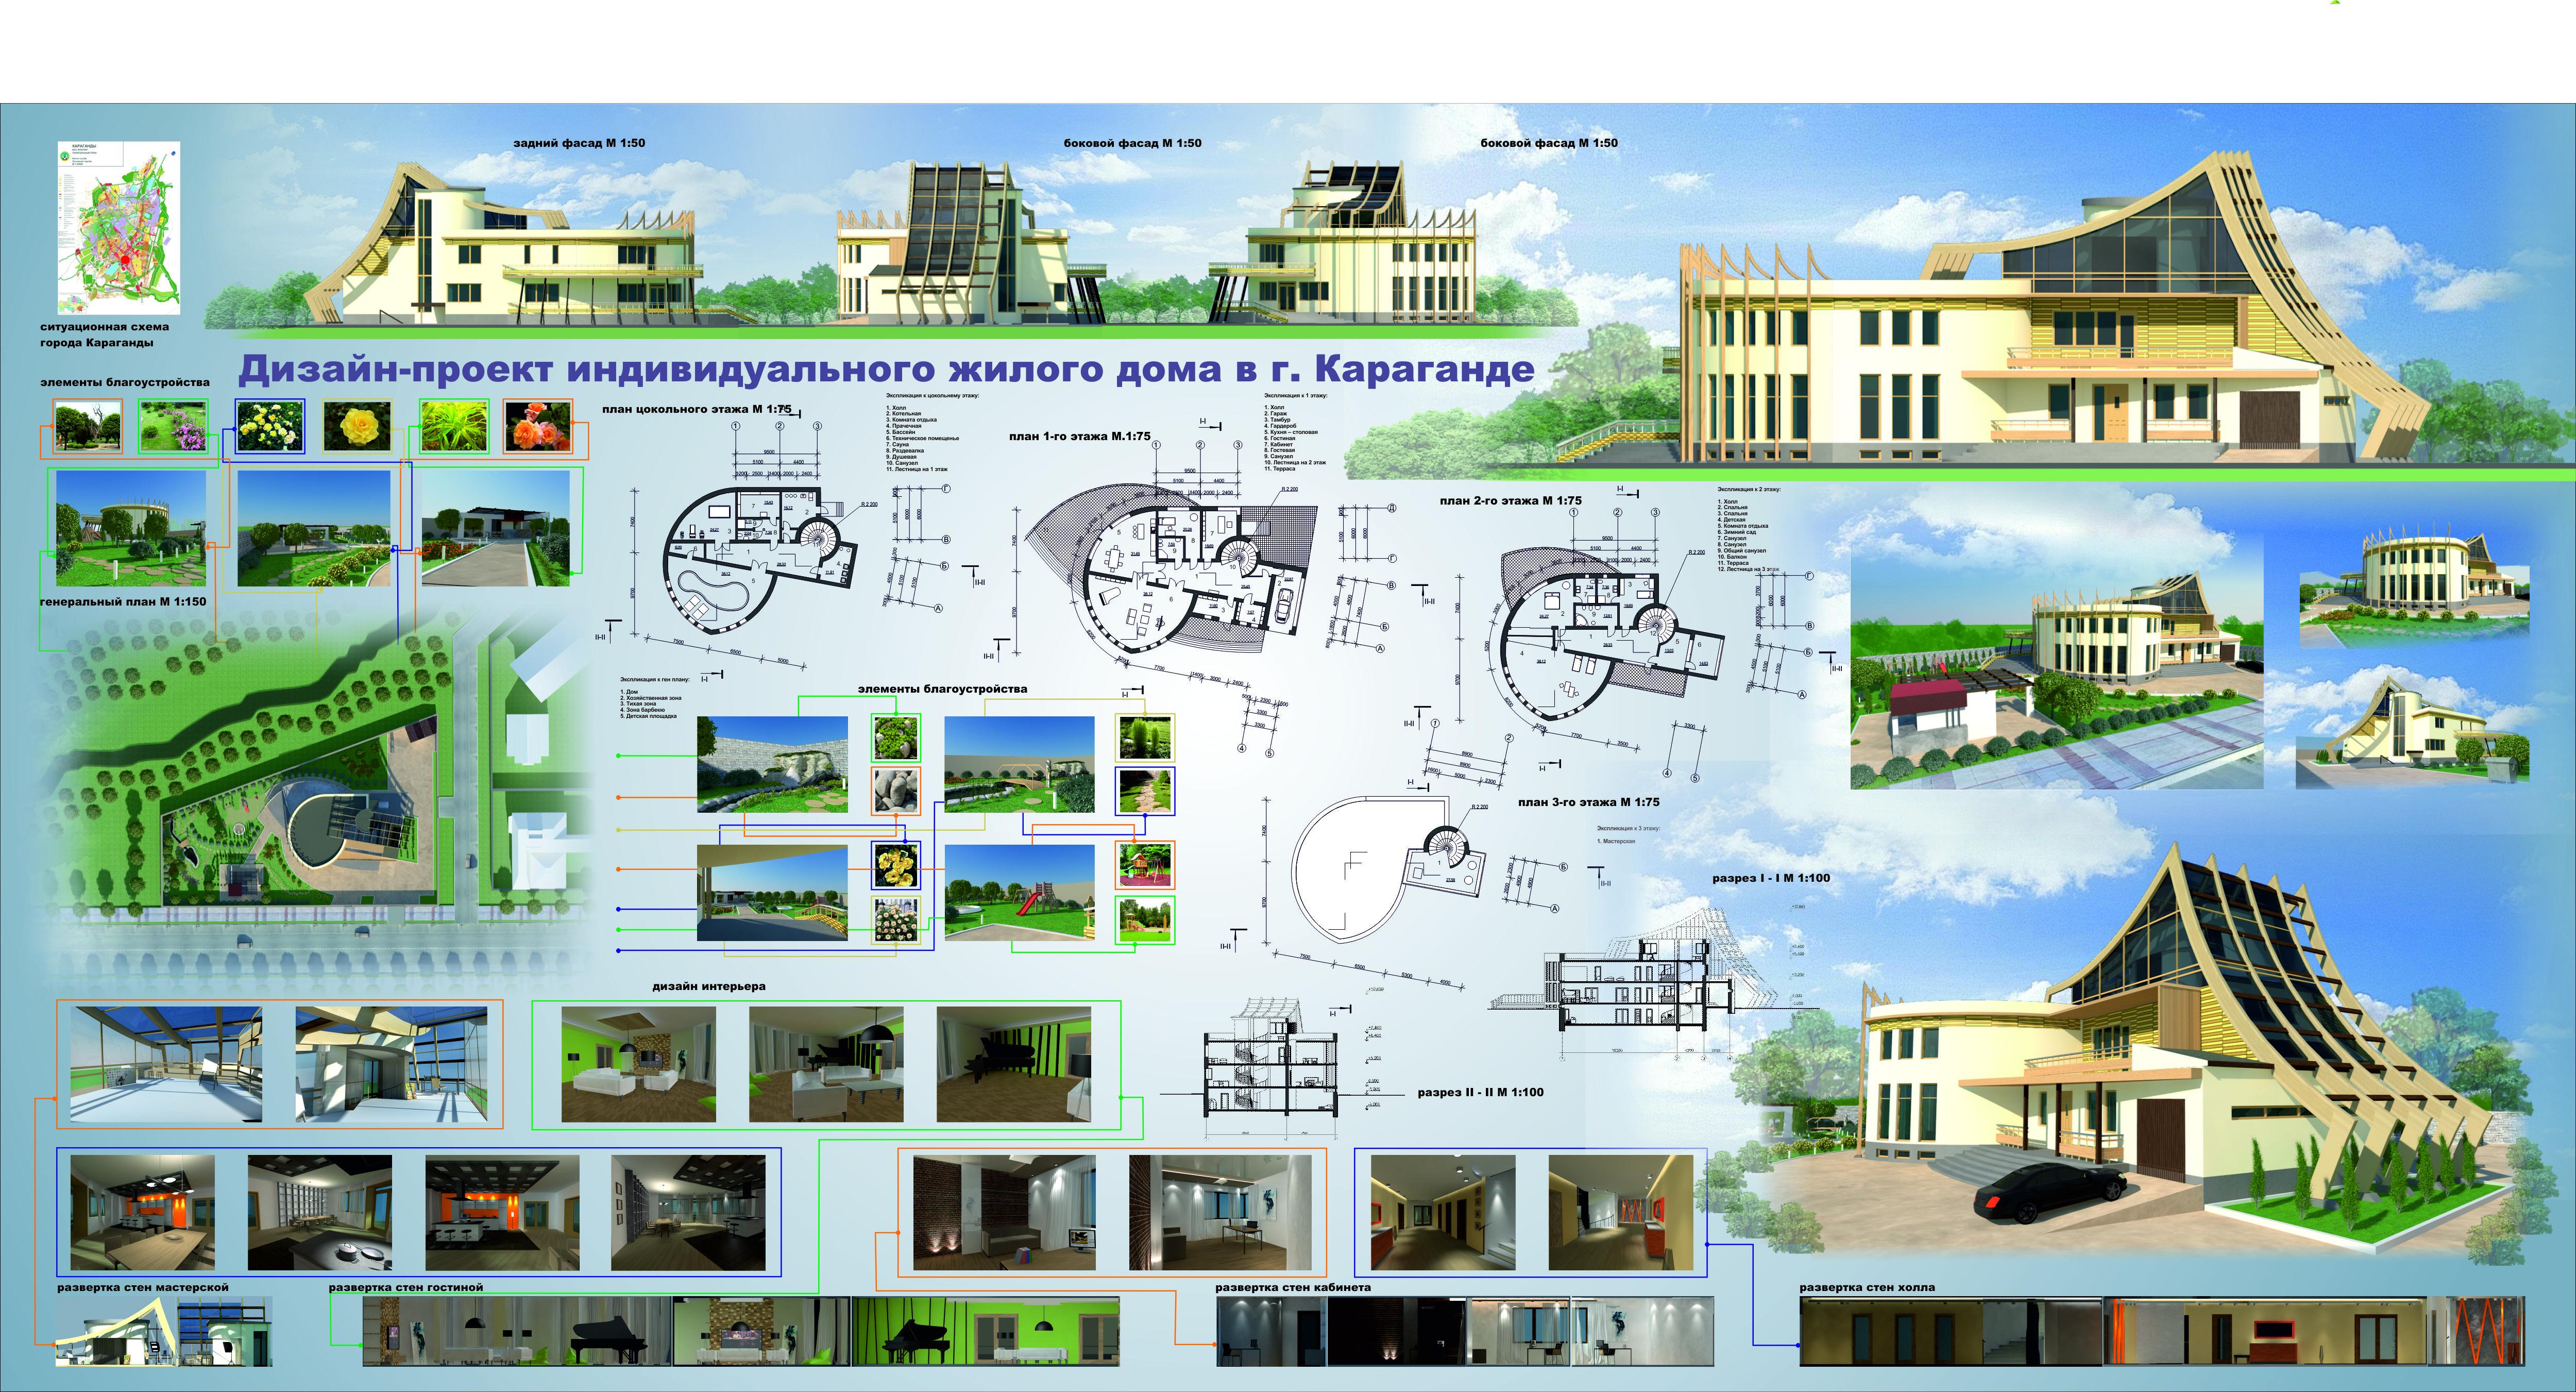 graduate s works karaganda state technical university  Дизайн проект индивидуального жилого дома г Караганде